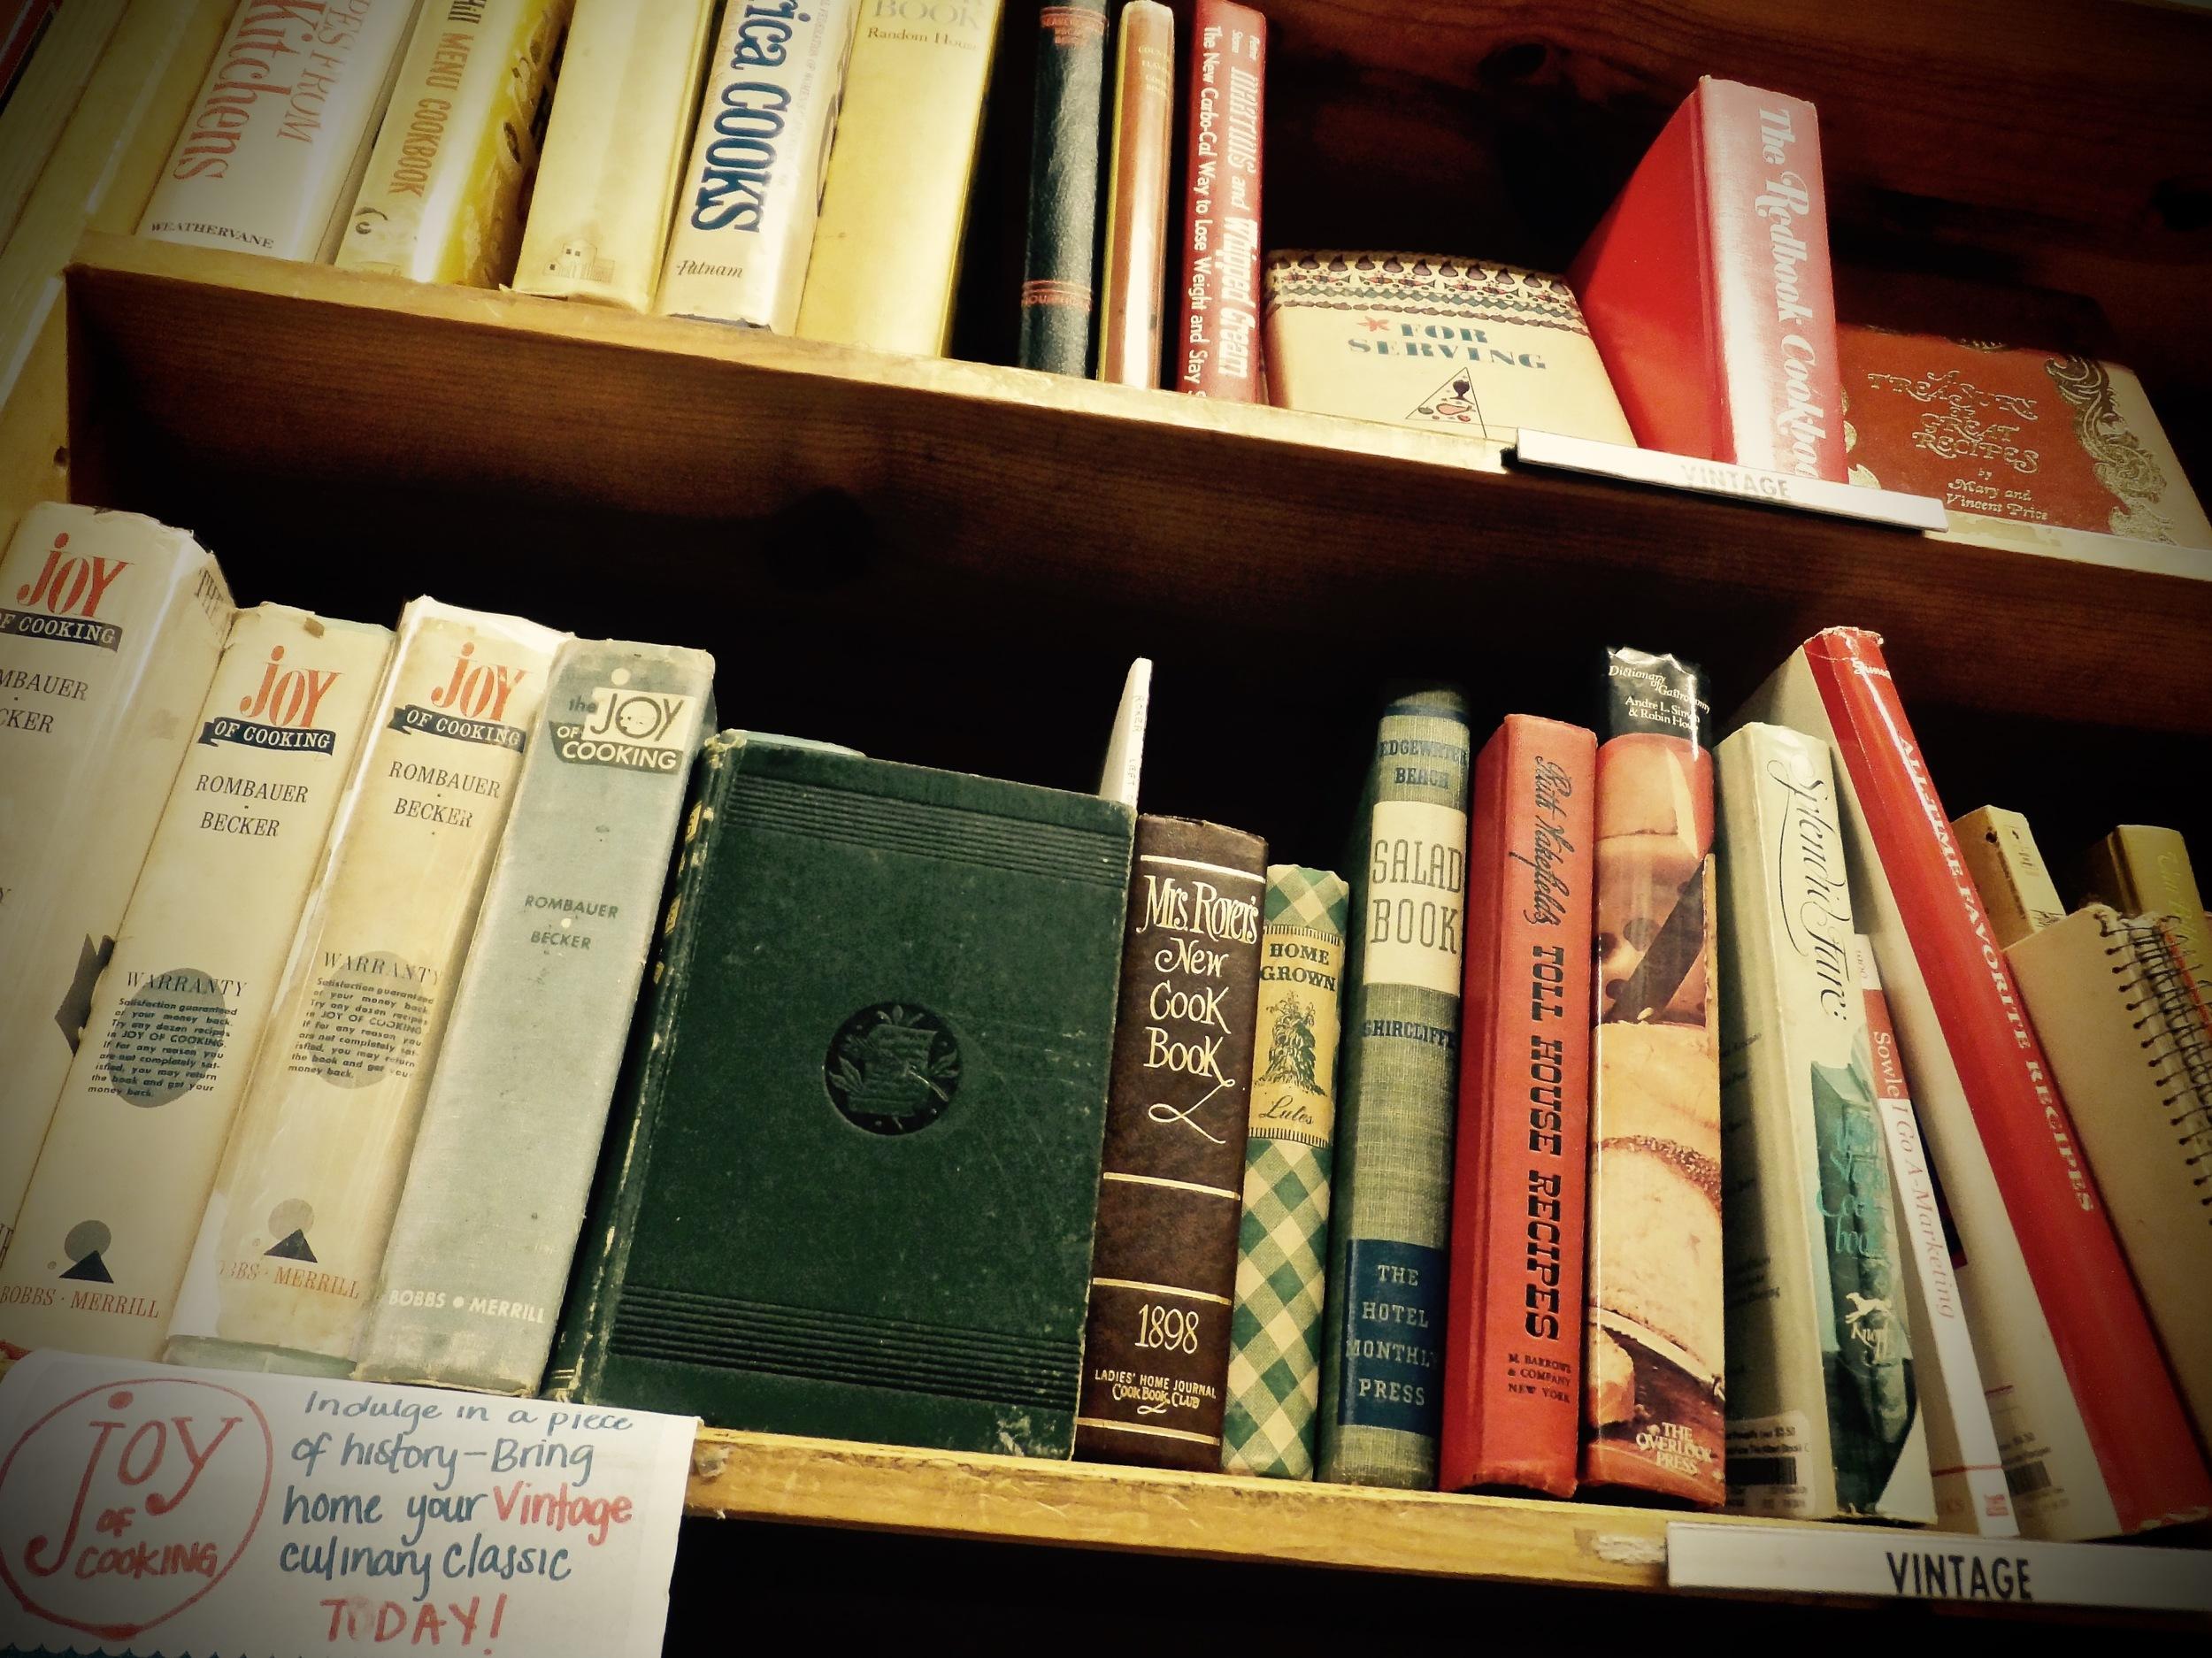 Hookedonbooksvintgecookbooks.jpg